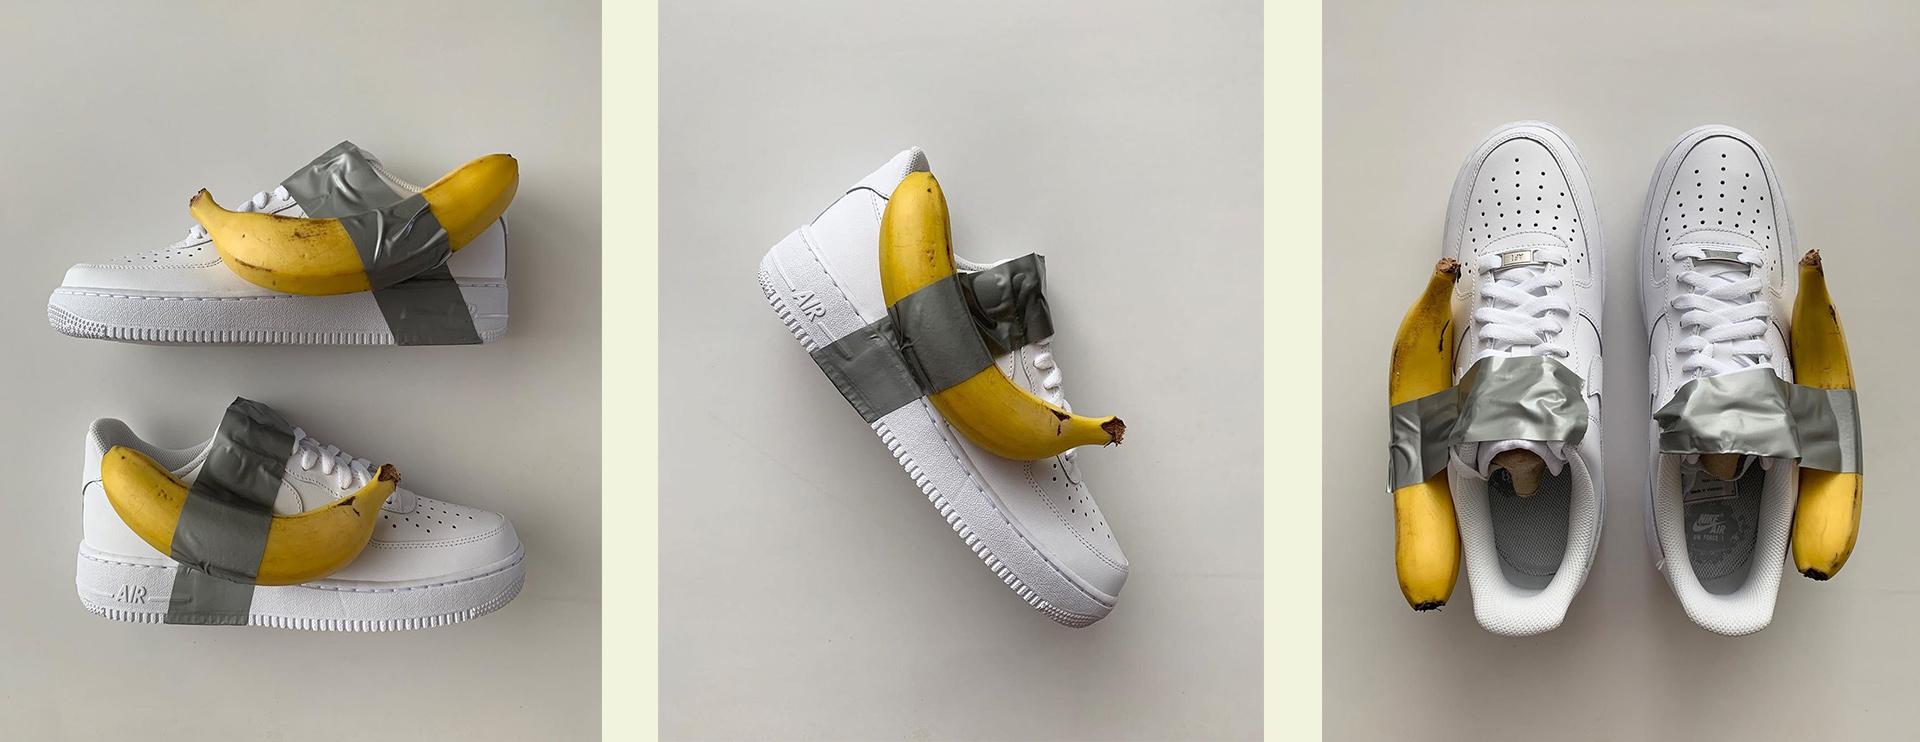 2 metcha design banana interna1 - IMAGE